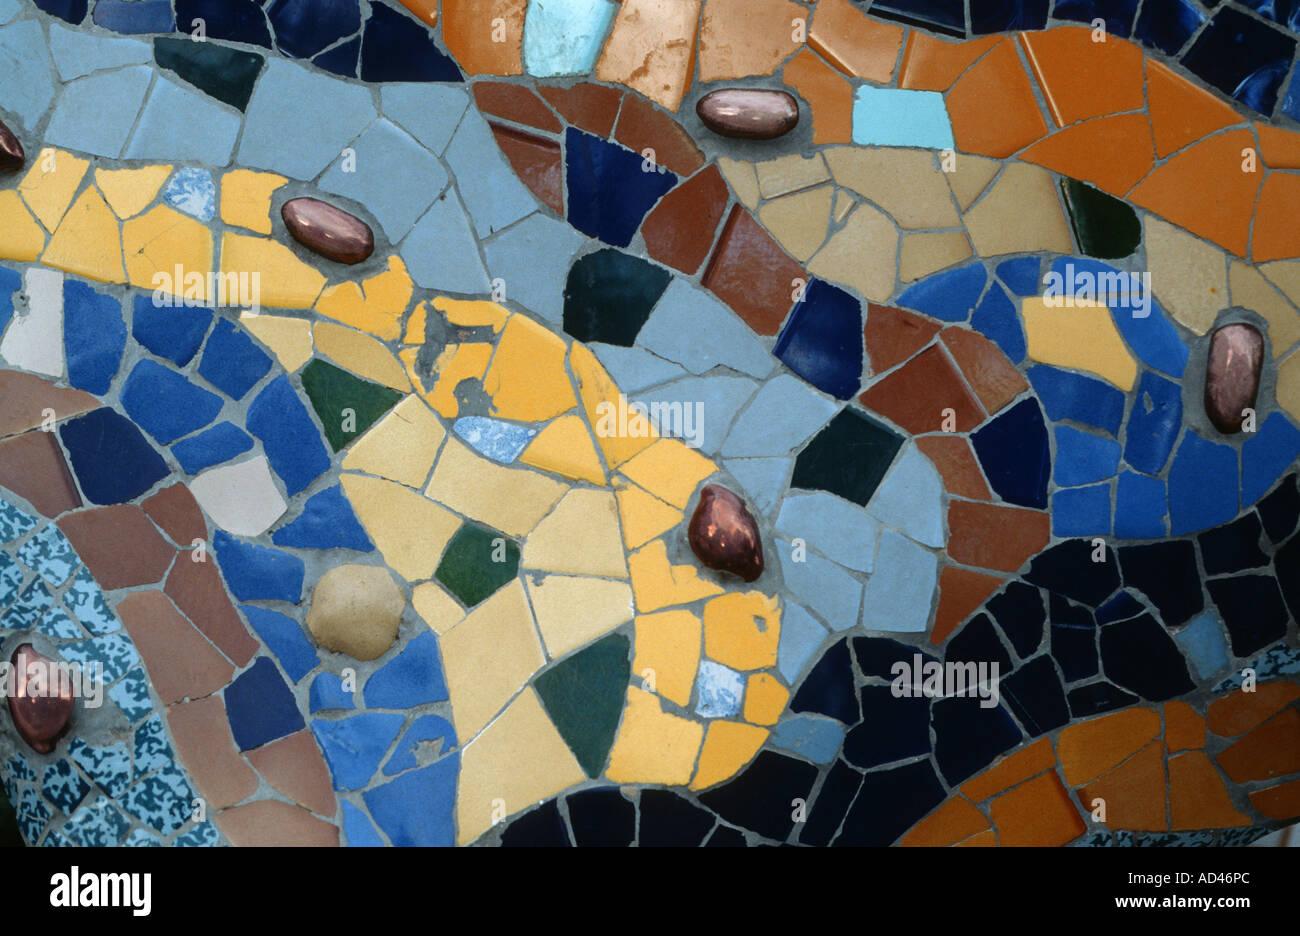 Detalle del mosaico del parque Guell dragon arquitectura de Gaudi Foto de stock